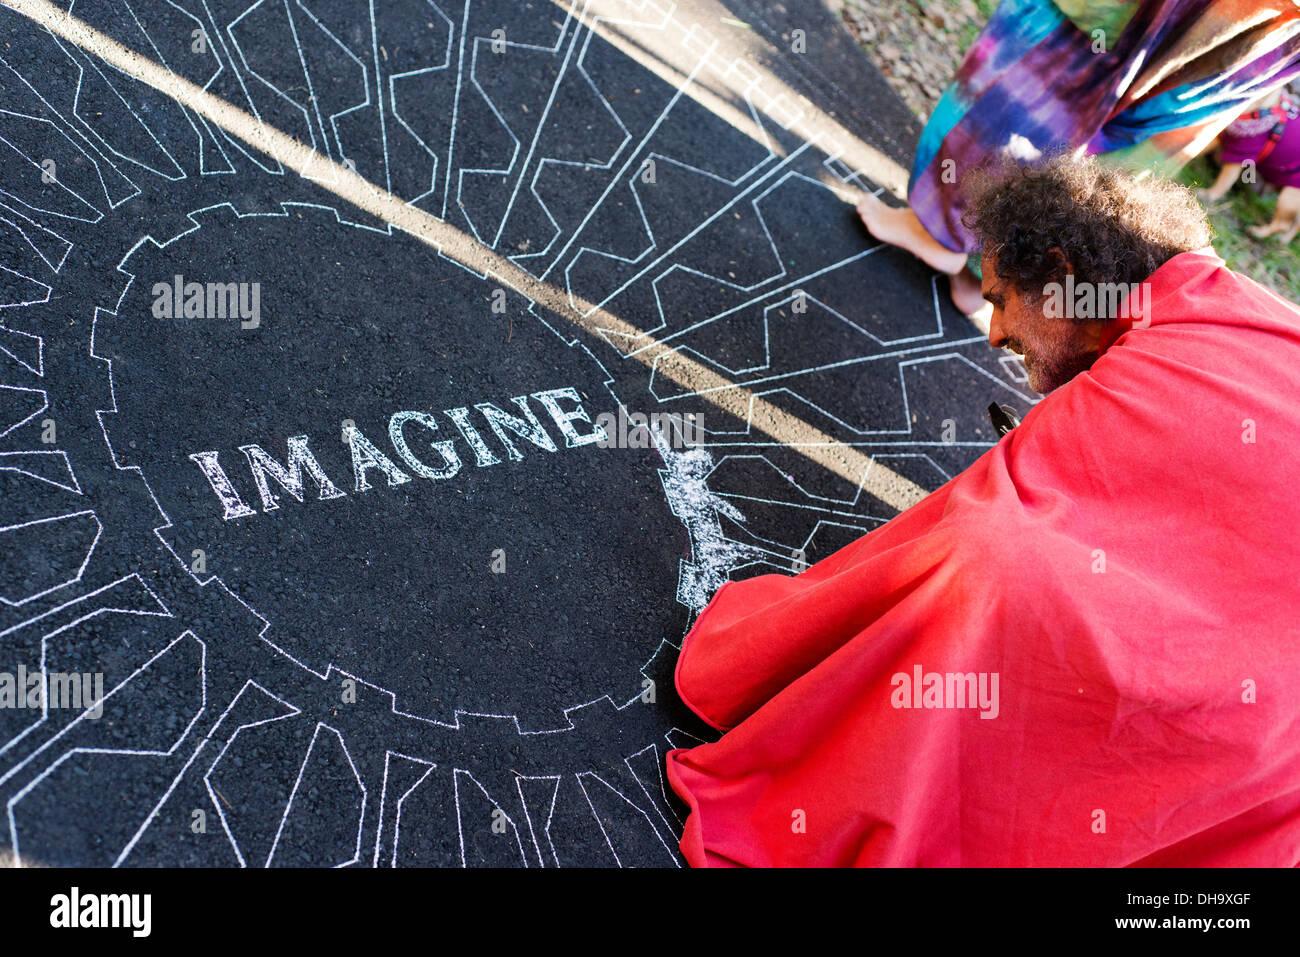 Man recreating the Central Park (NY) Imagine mural in Nimbin. - Stock Image